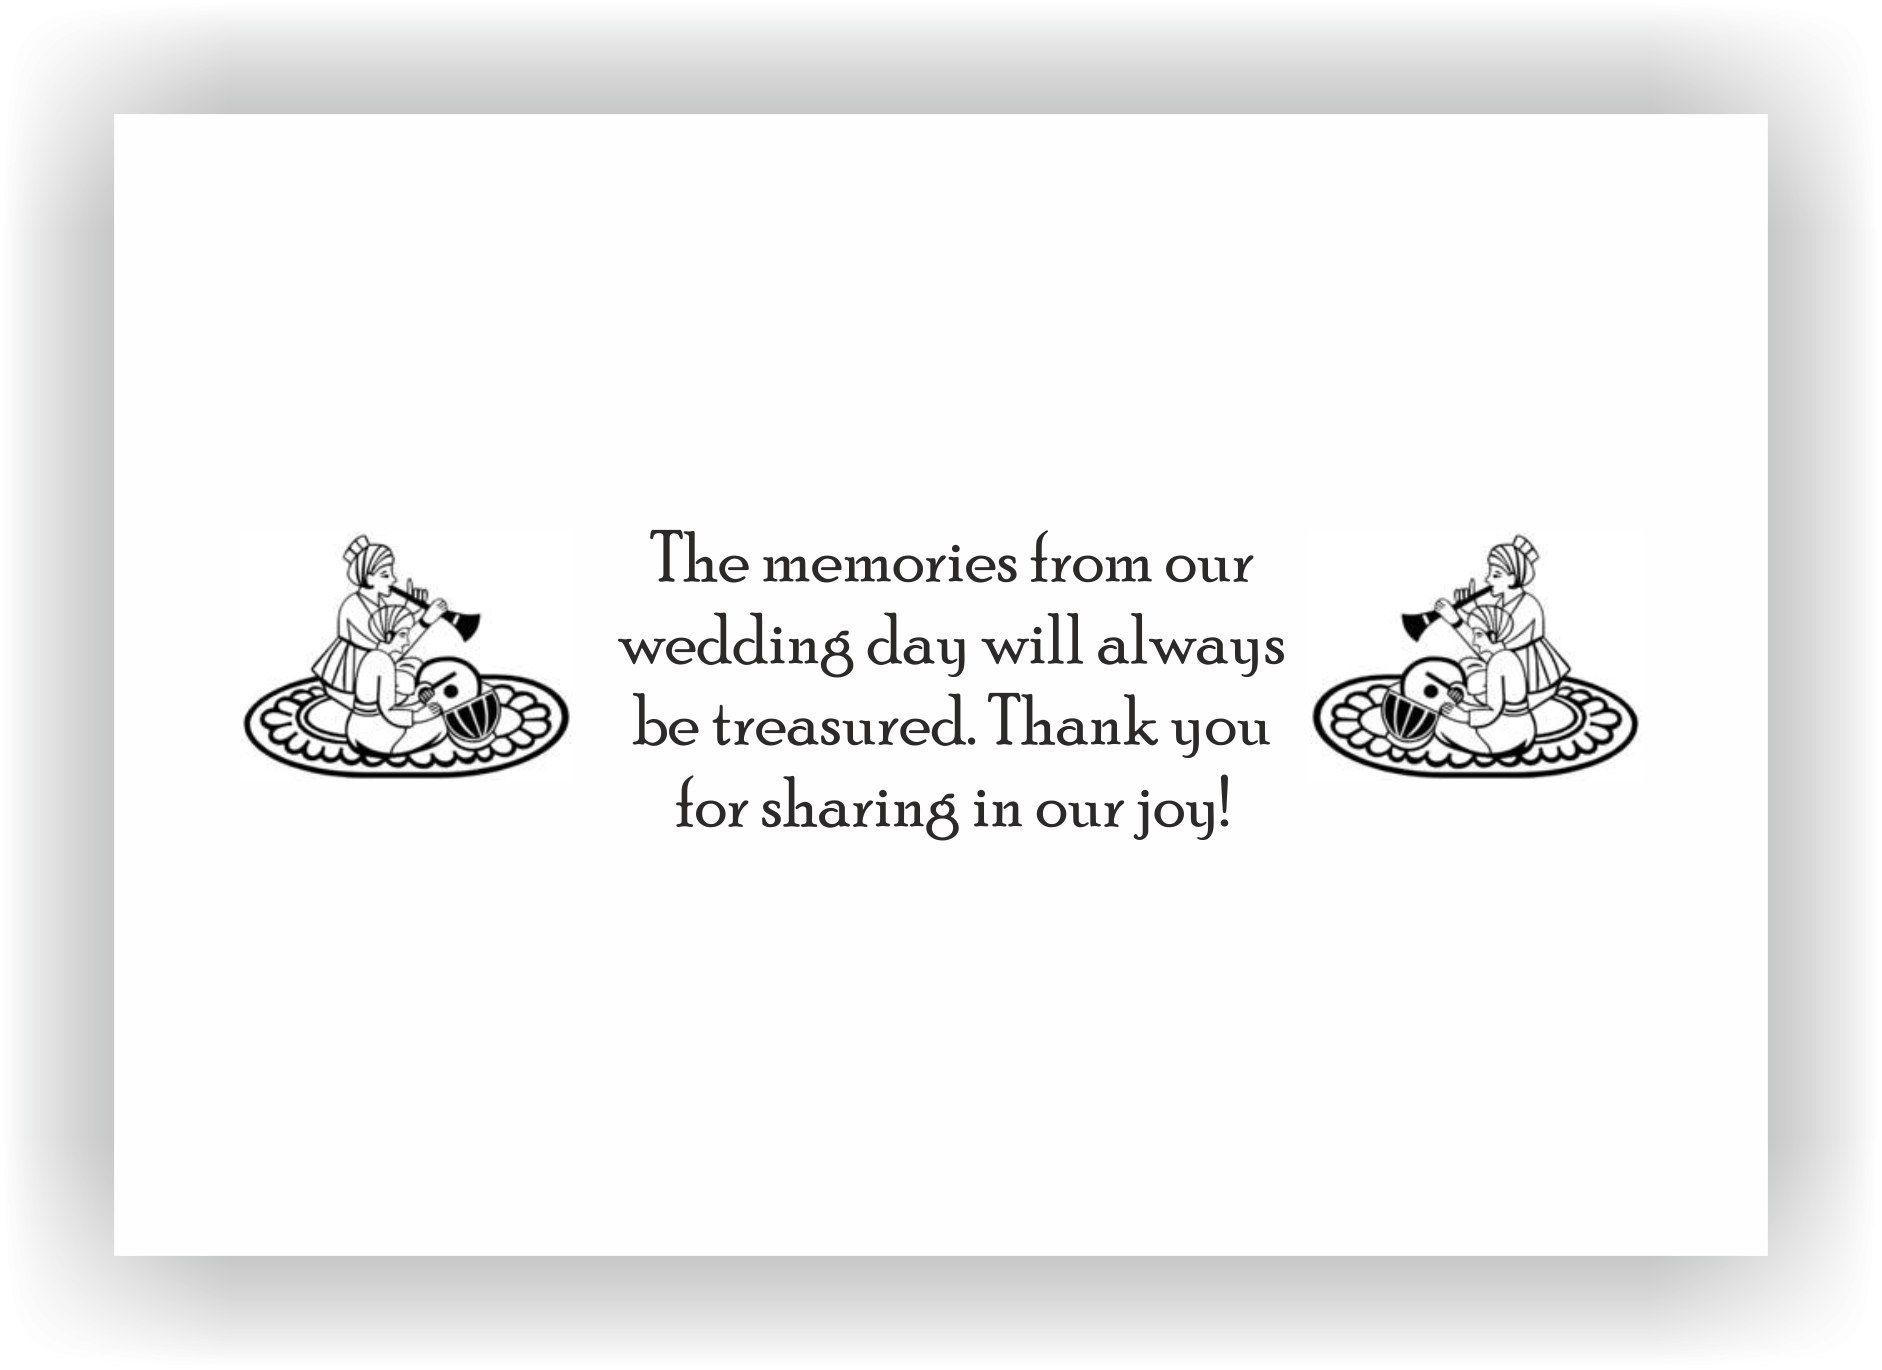 Wedding Return GiftsMessages